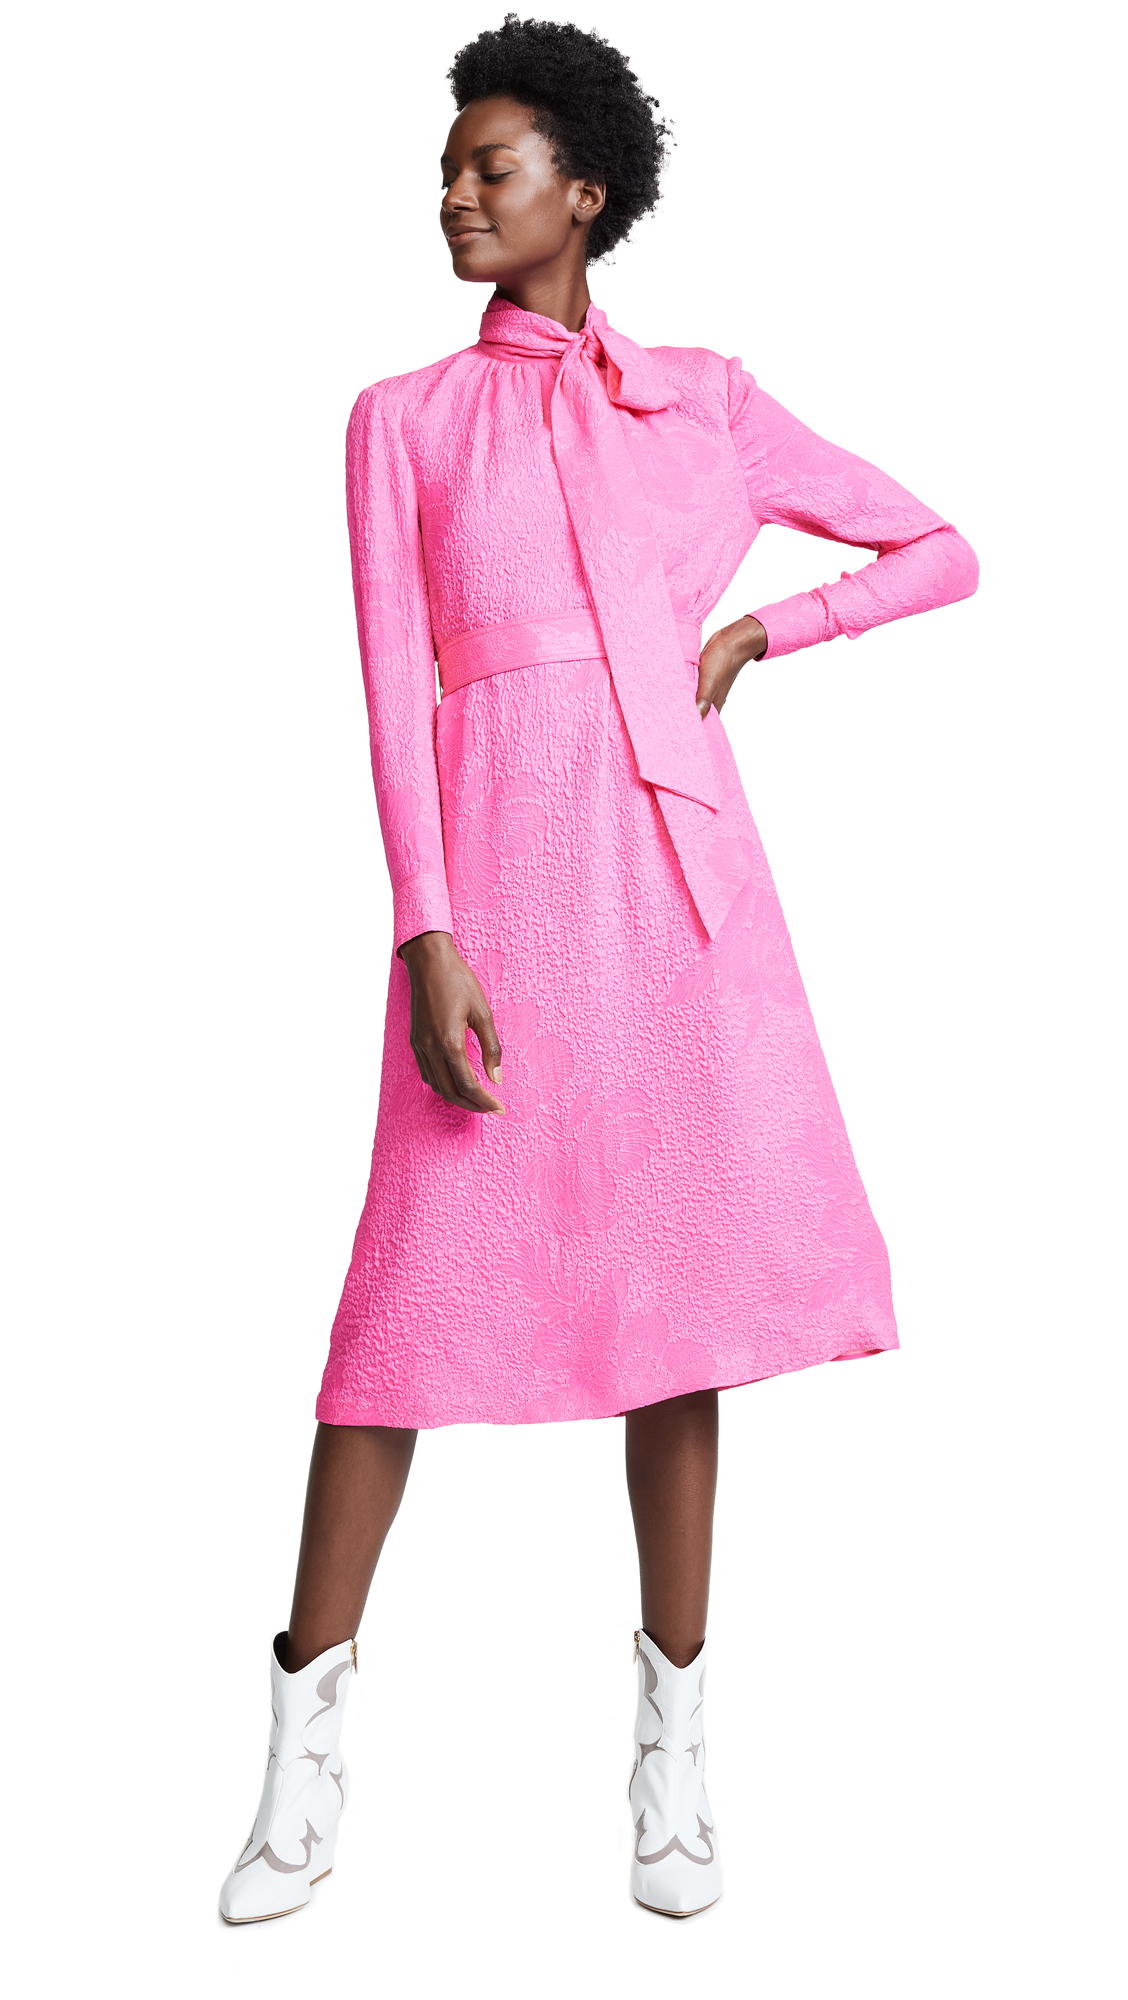 Tory Burch Brielle Dress - Crazy Pink